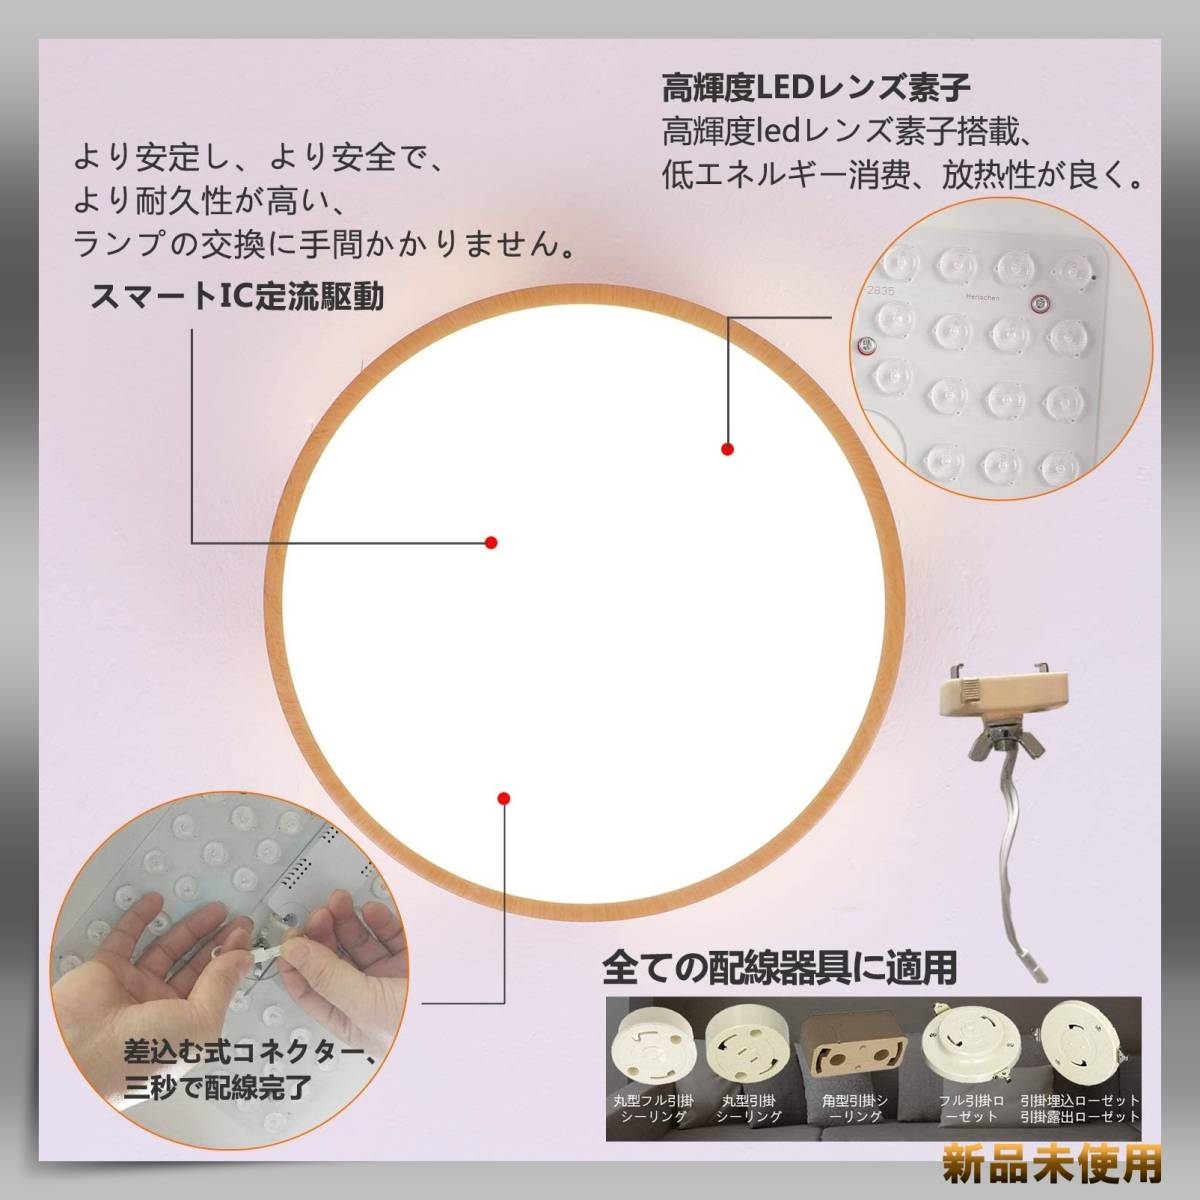 LEDシーリングライト 30W 天井照明器具 木目調 和風 薄型 シーリングライト 無段階調光調色 リモコン付き_画像6